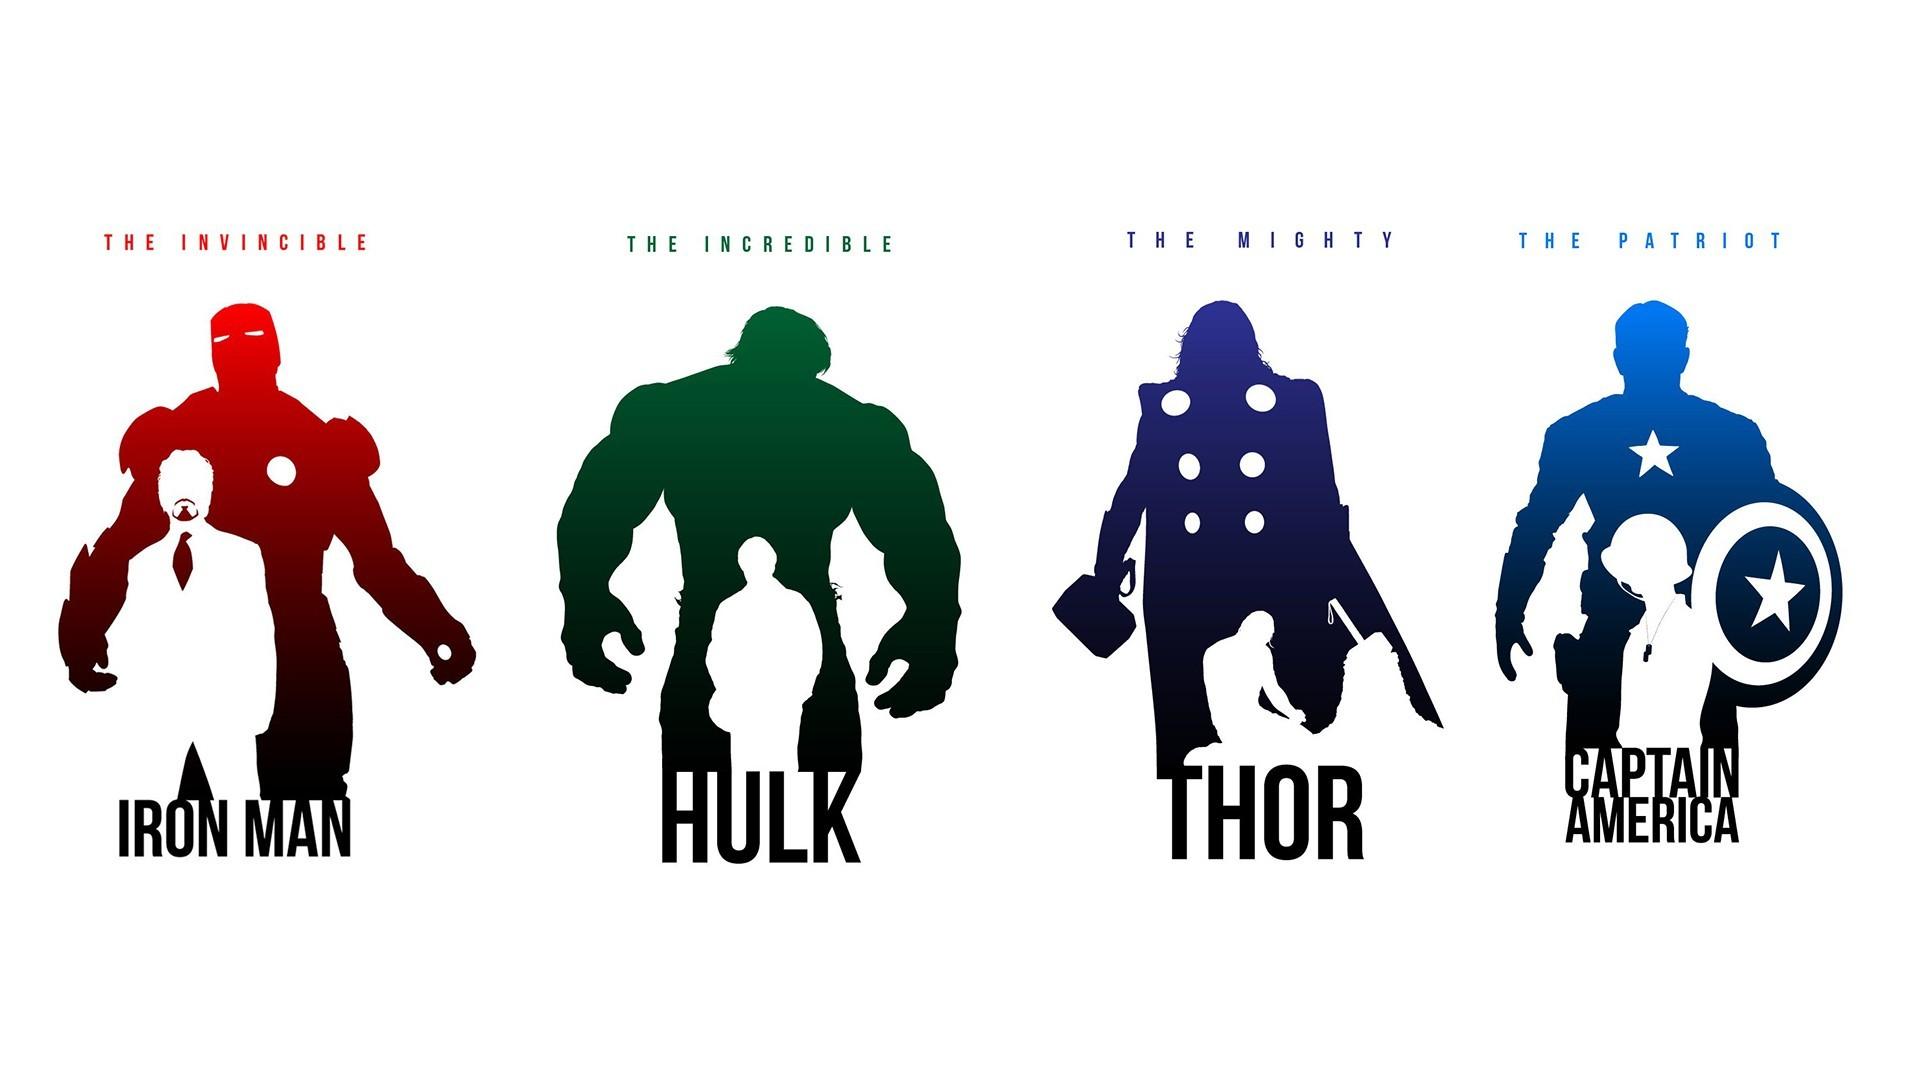 General 1920x1080 comics Hulk Iron Man Captain America Thor Marvel Cinematic Universe